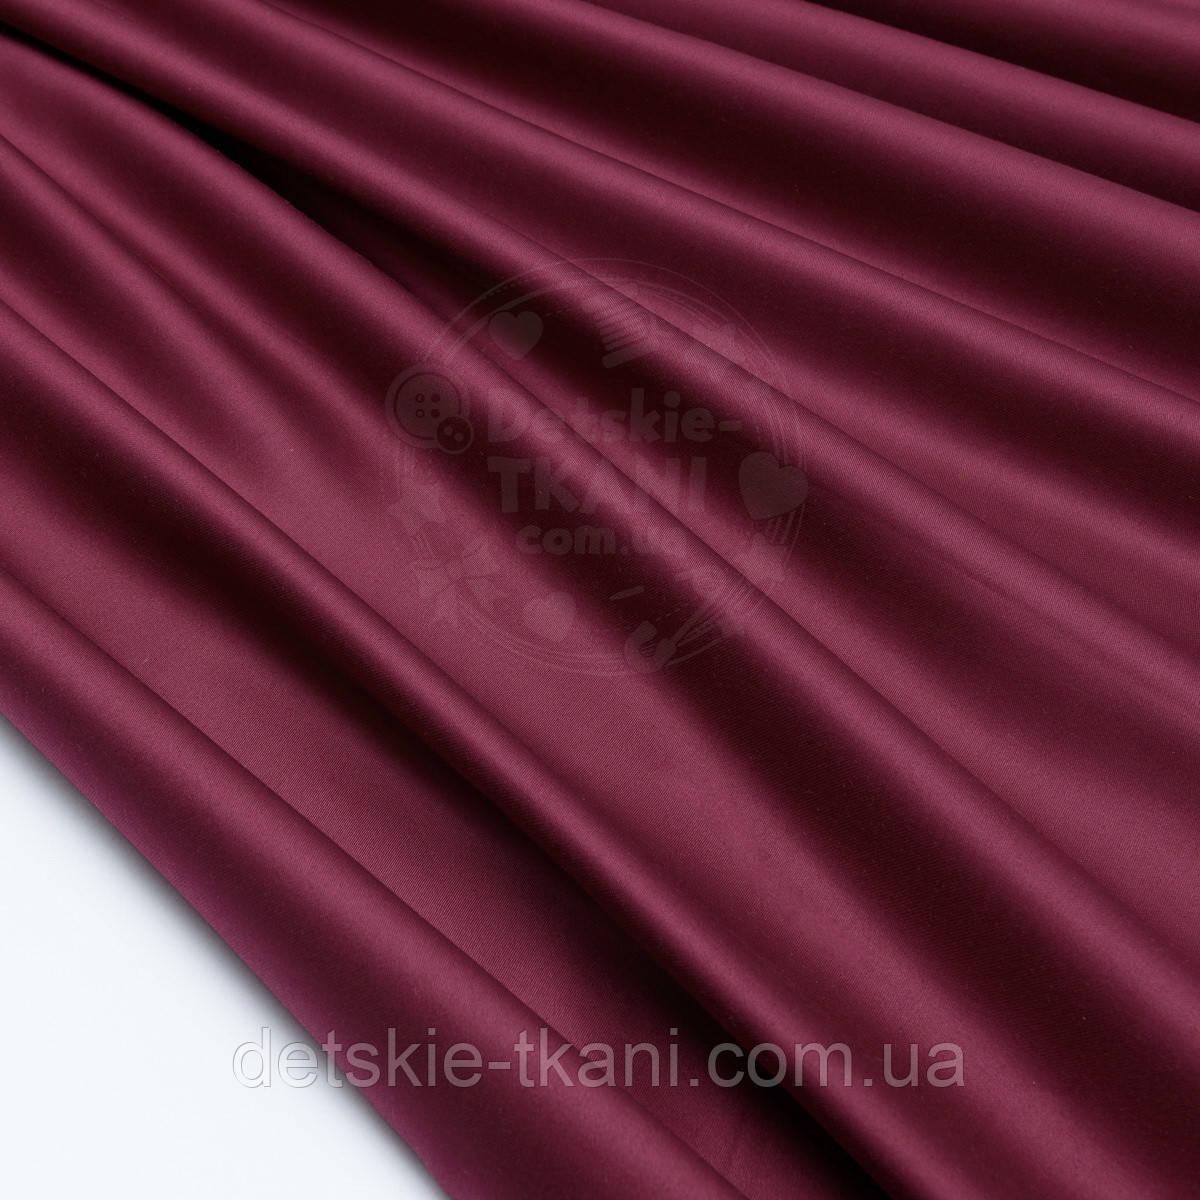 Лоскут сатина цвет бордо №1528с,размер 33*120 см